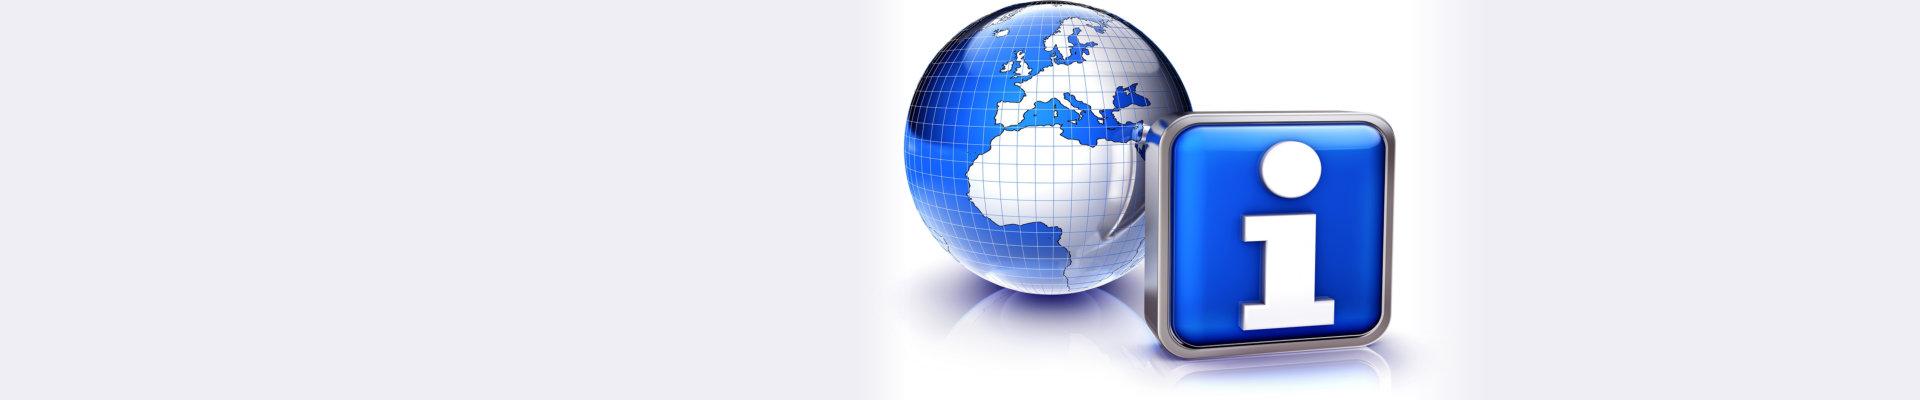 globe and internet icon